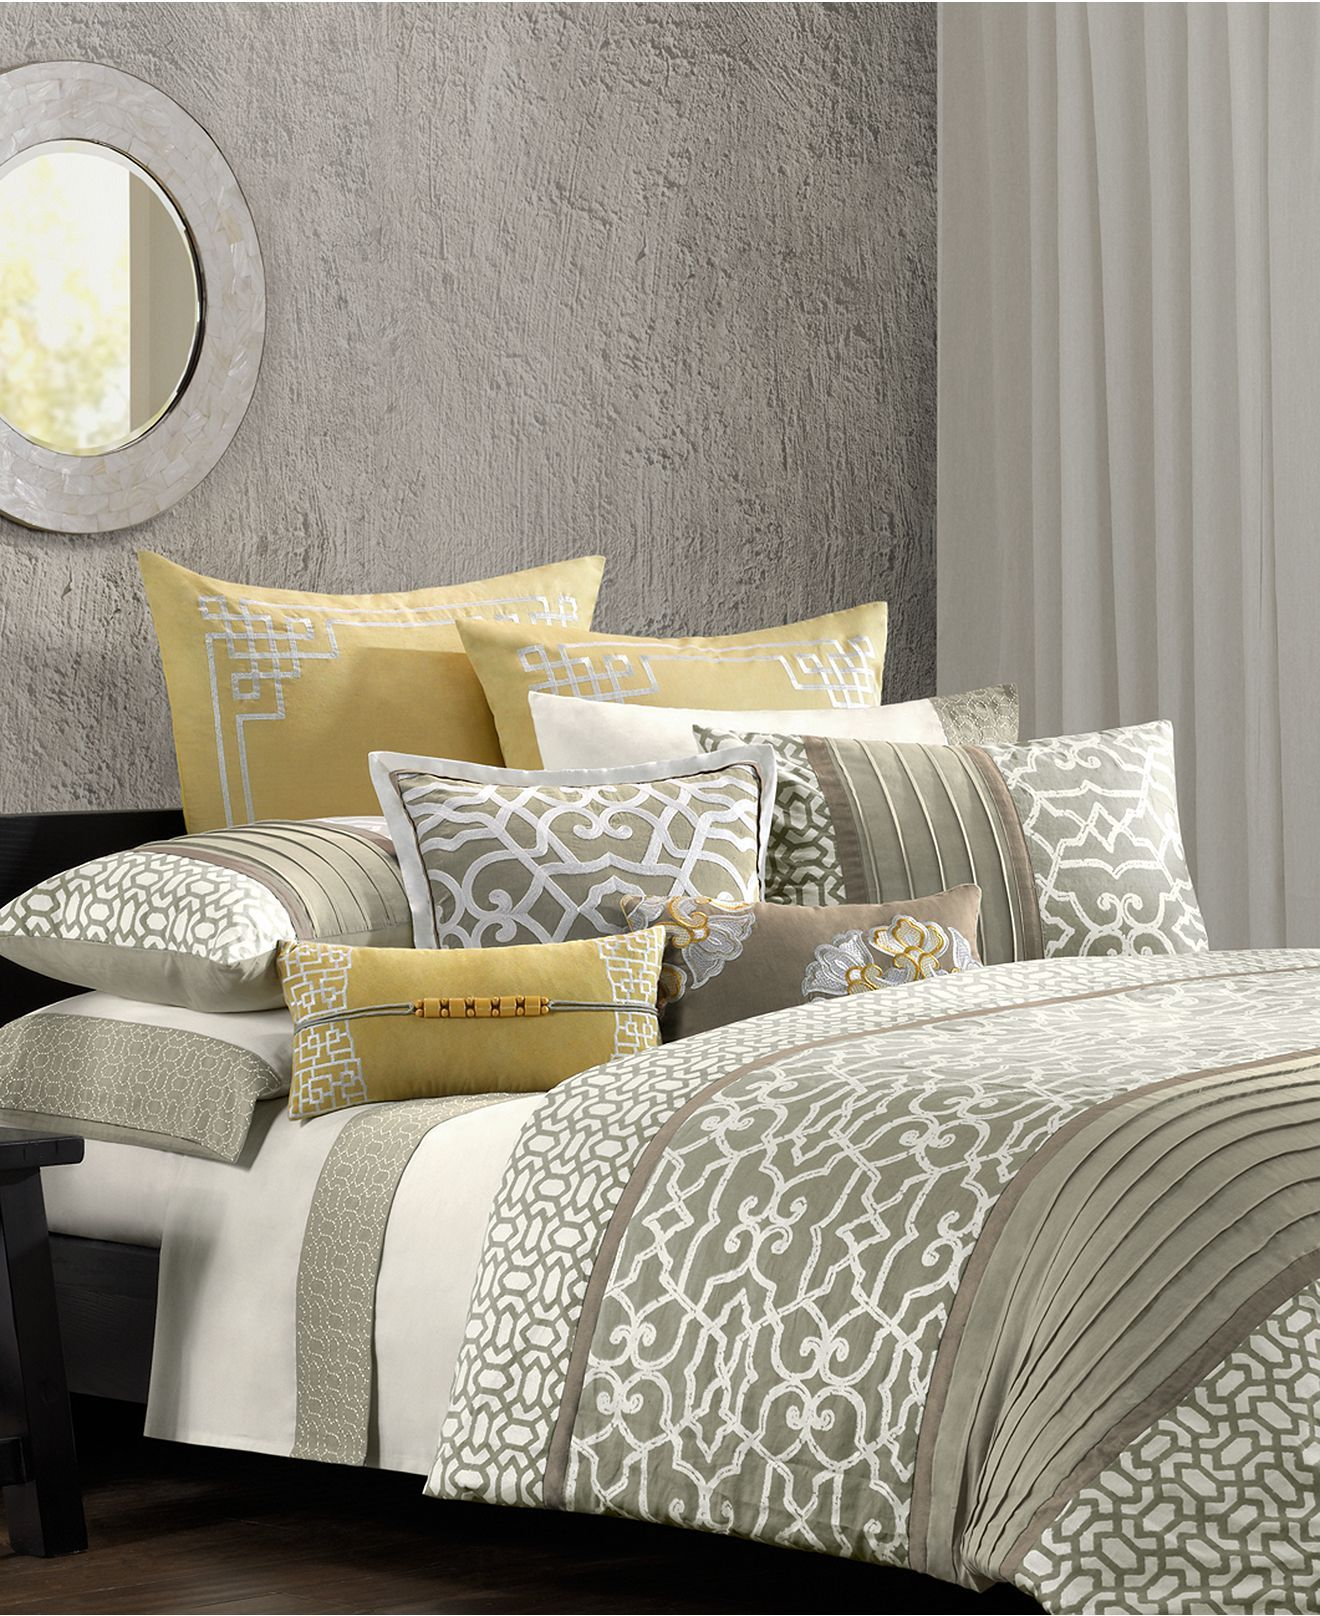 20 Gray And Yellow Nursery Designs With Refreshing Elegance: N Natori Bedding, Fretwork Comforter Sets